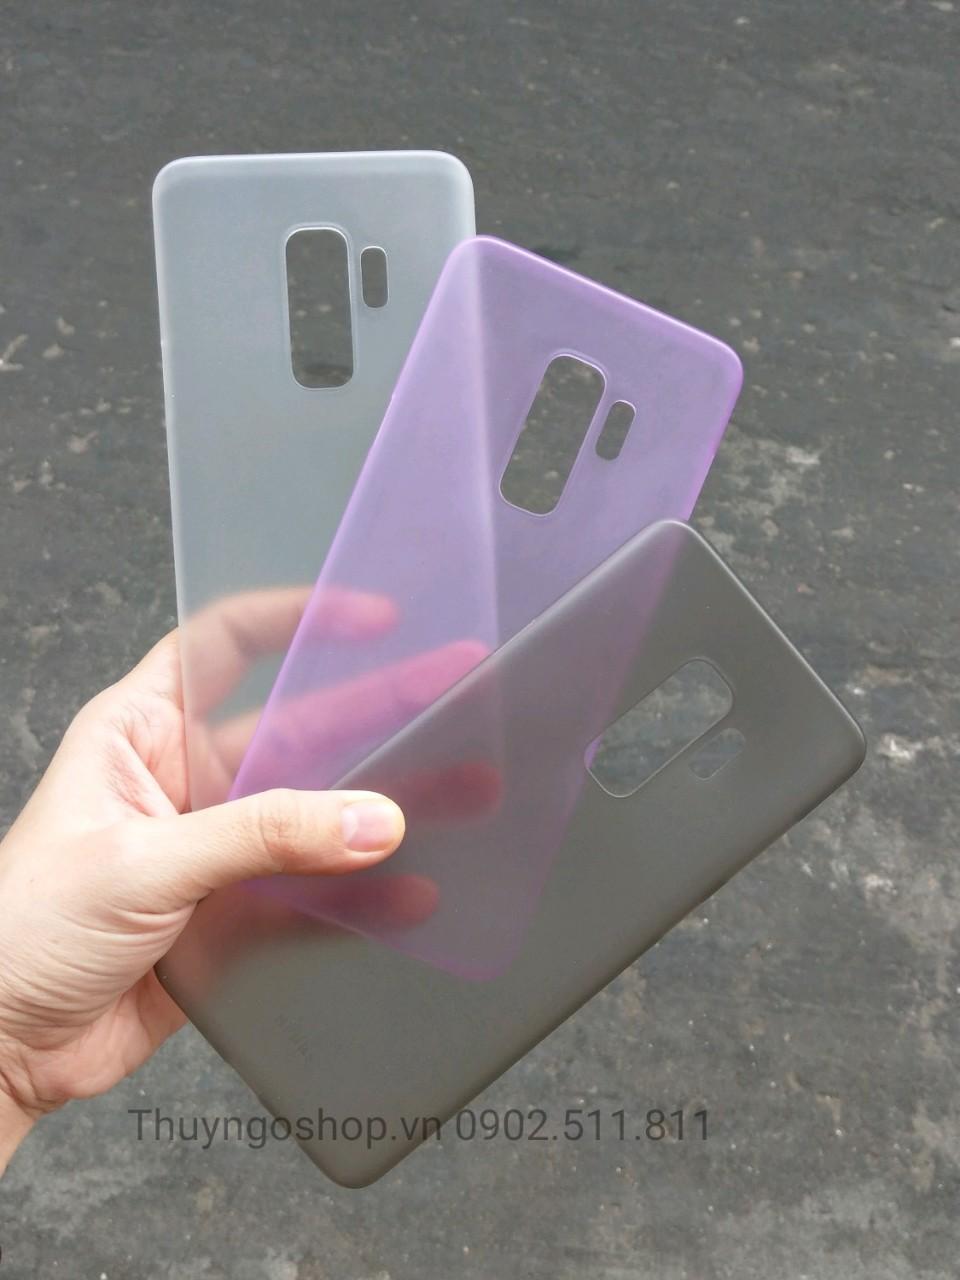 Samsung S9 / S9 Plus Ốp Lưng Benks Siêu Mỏng 0.3mm